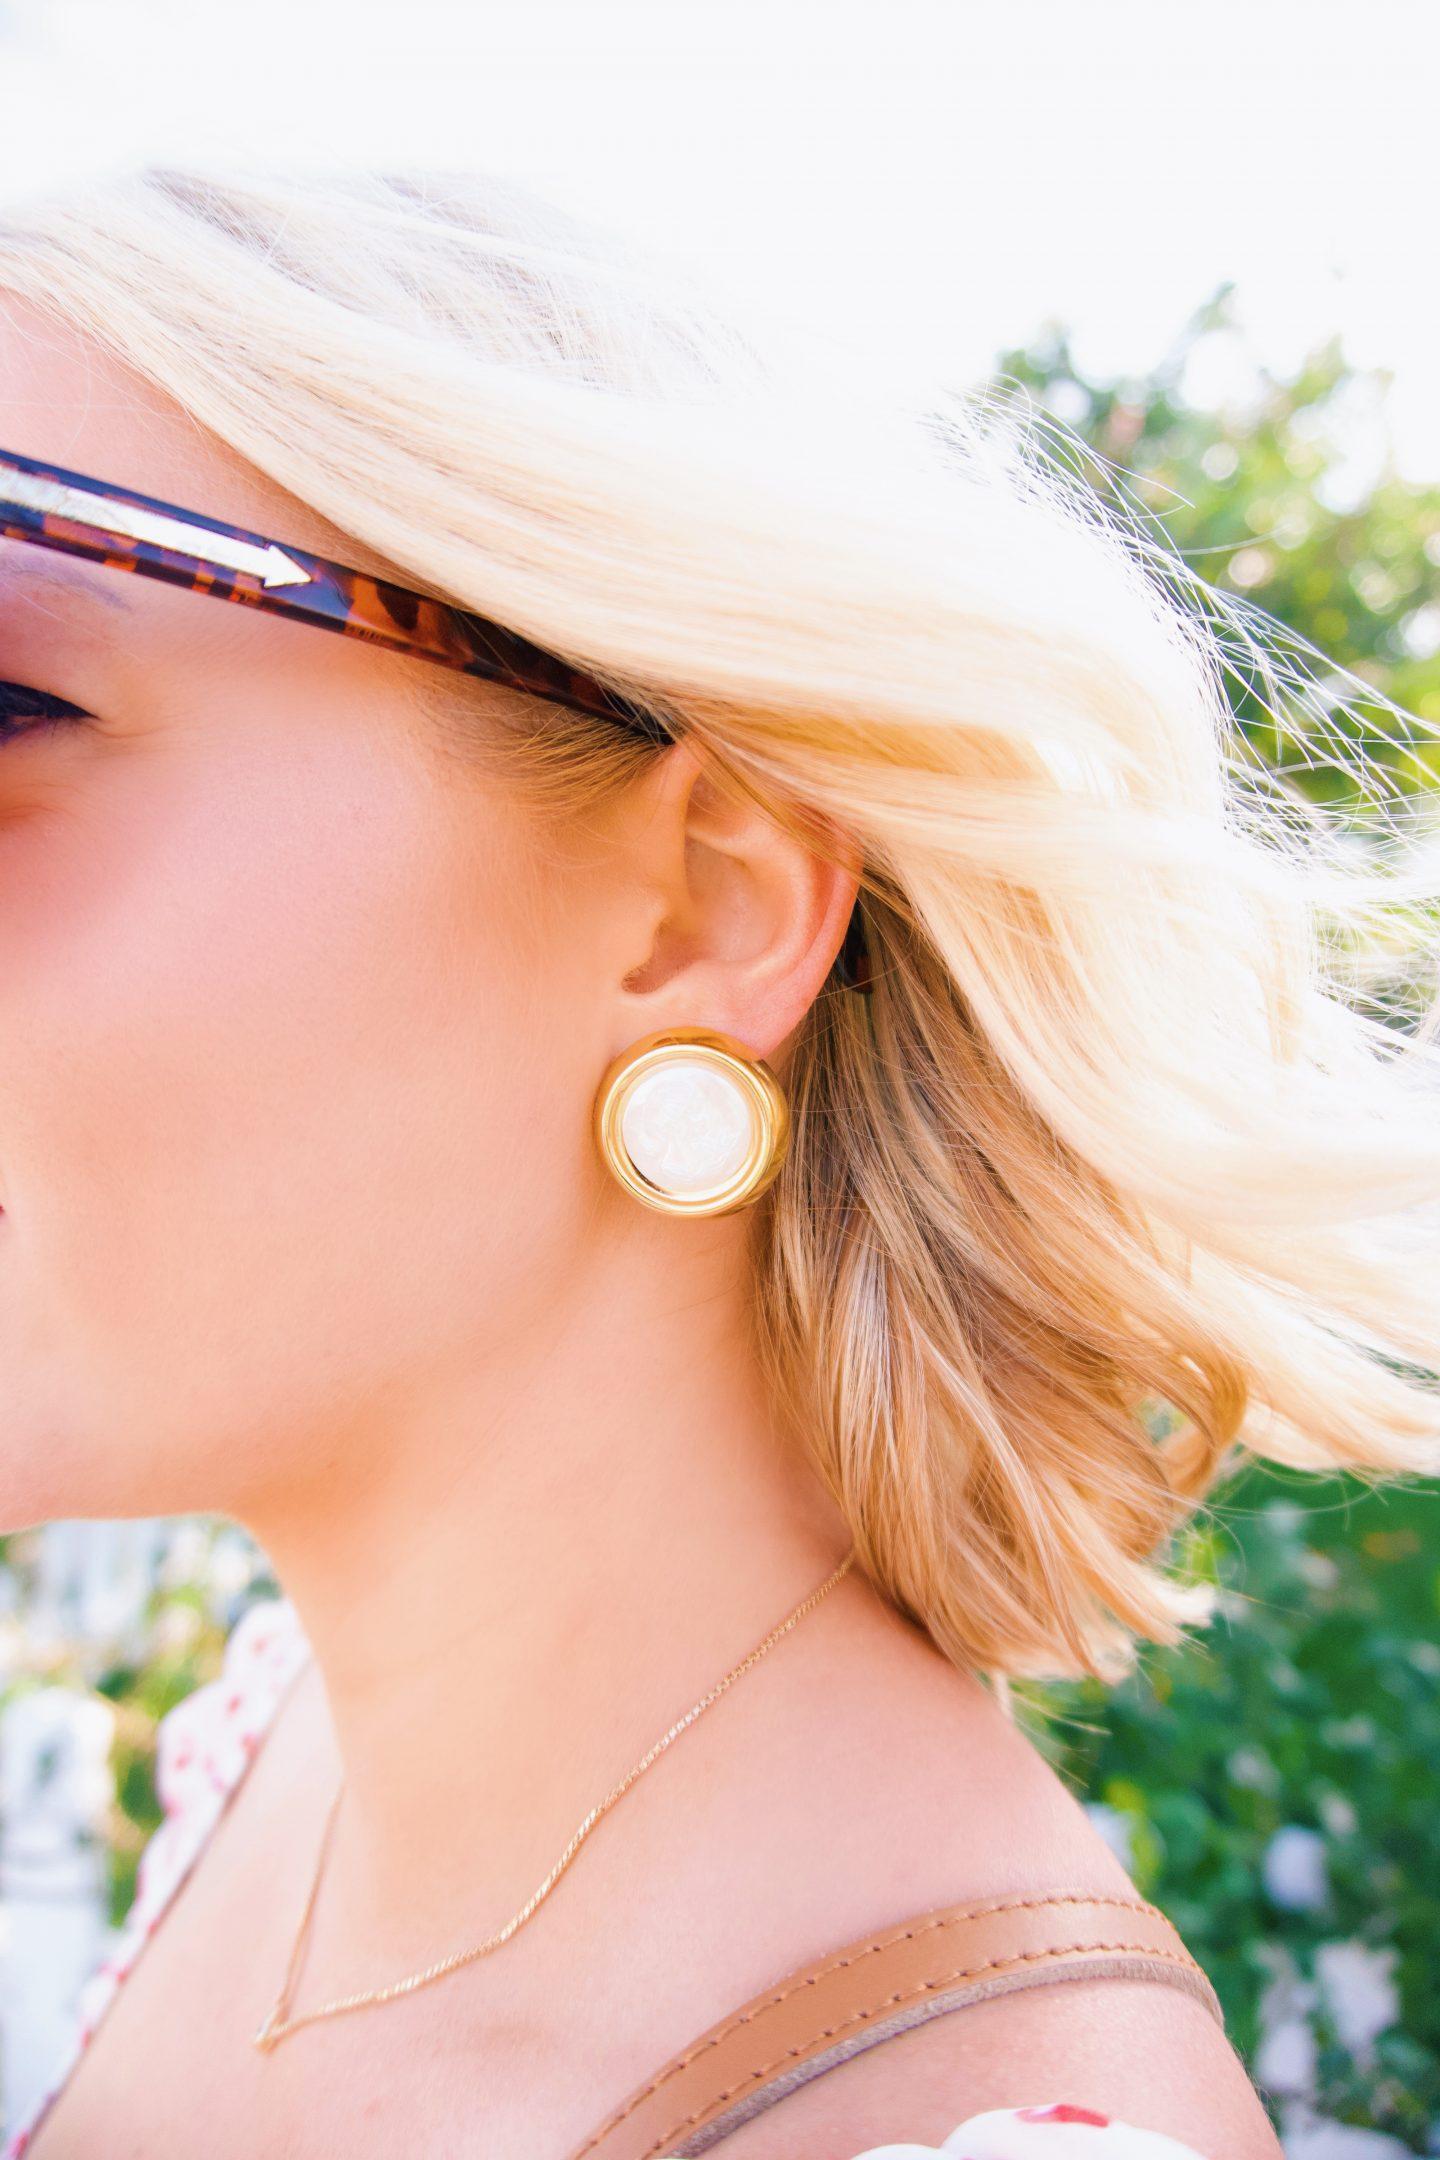 Neely Phelan iridescent stud earrings